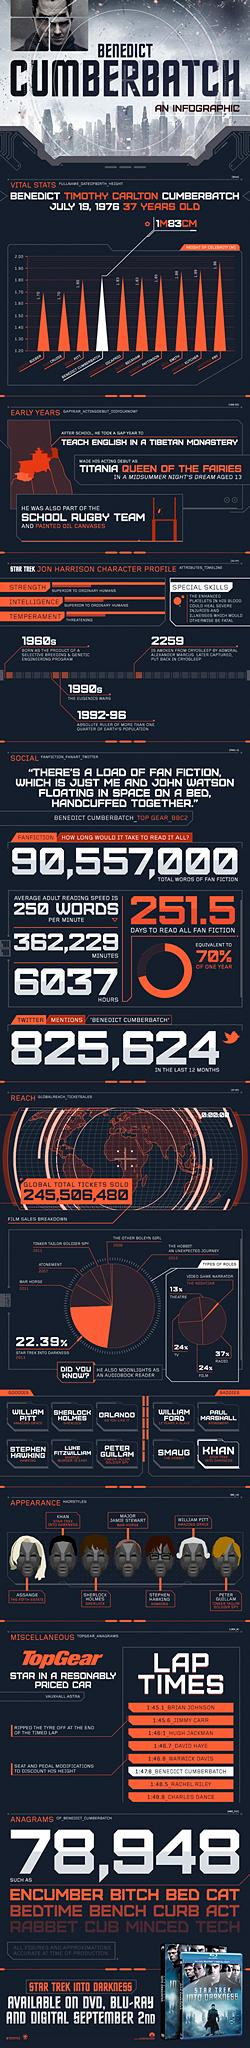 benedict-cumberbatch--an-infographic_5225a0d22c618